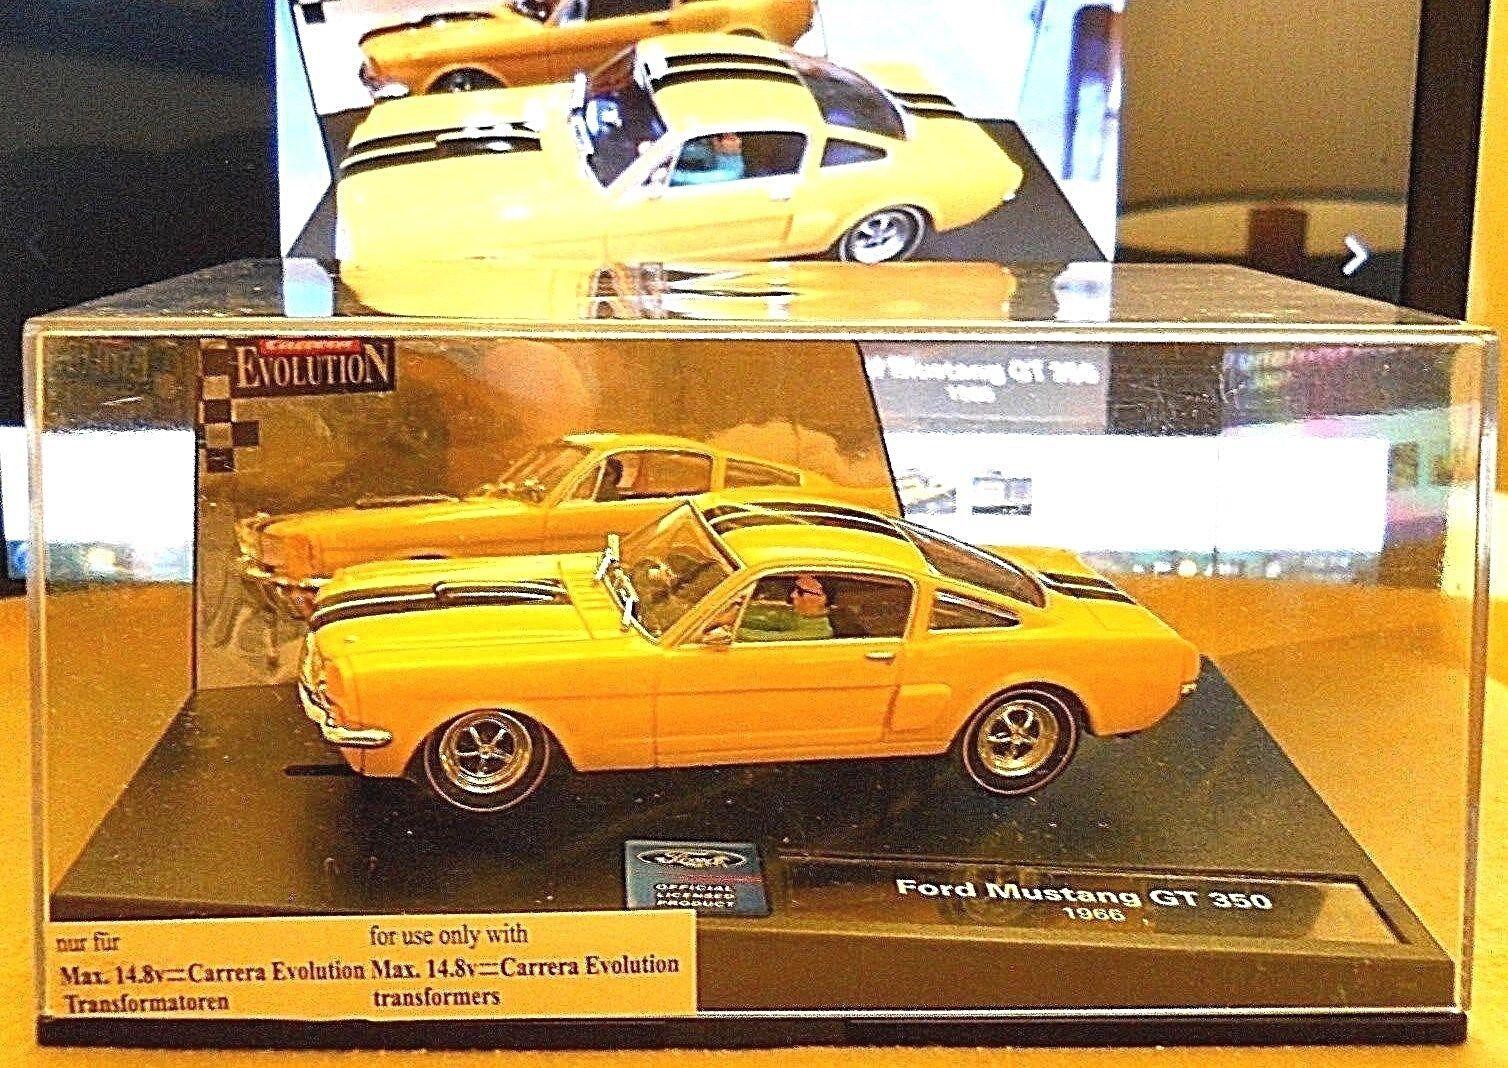 Ranura de coche Cocherera evolution 27148 1966 Ford Mustang GT 350 1 32 en Caja Original